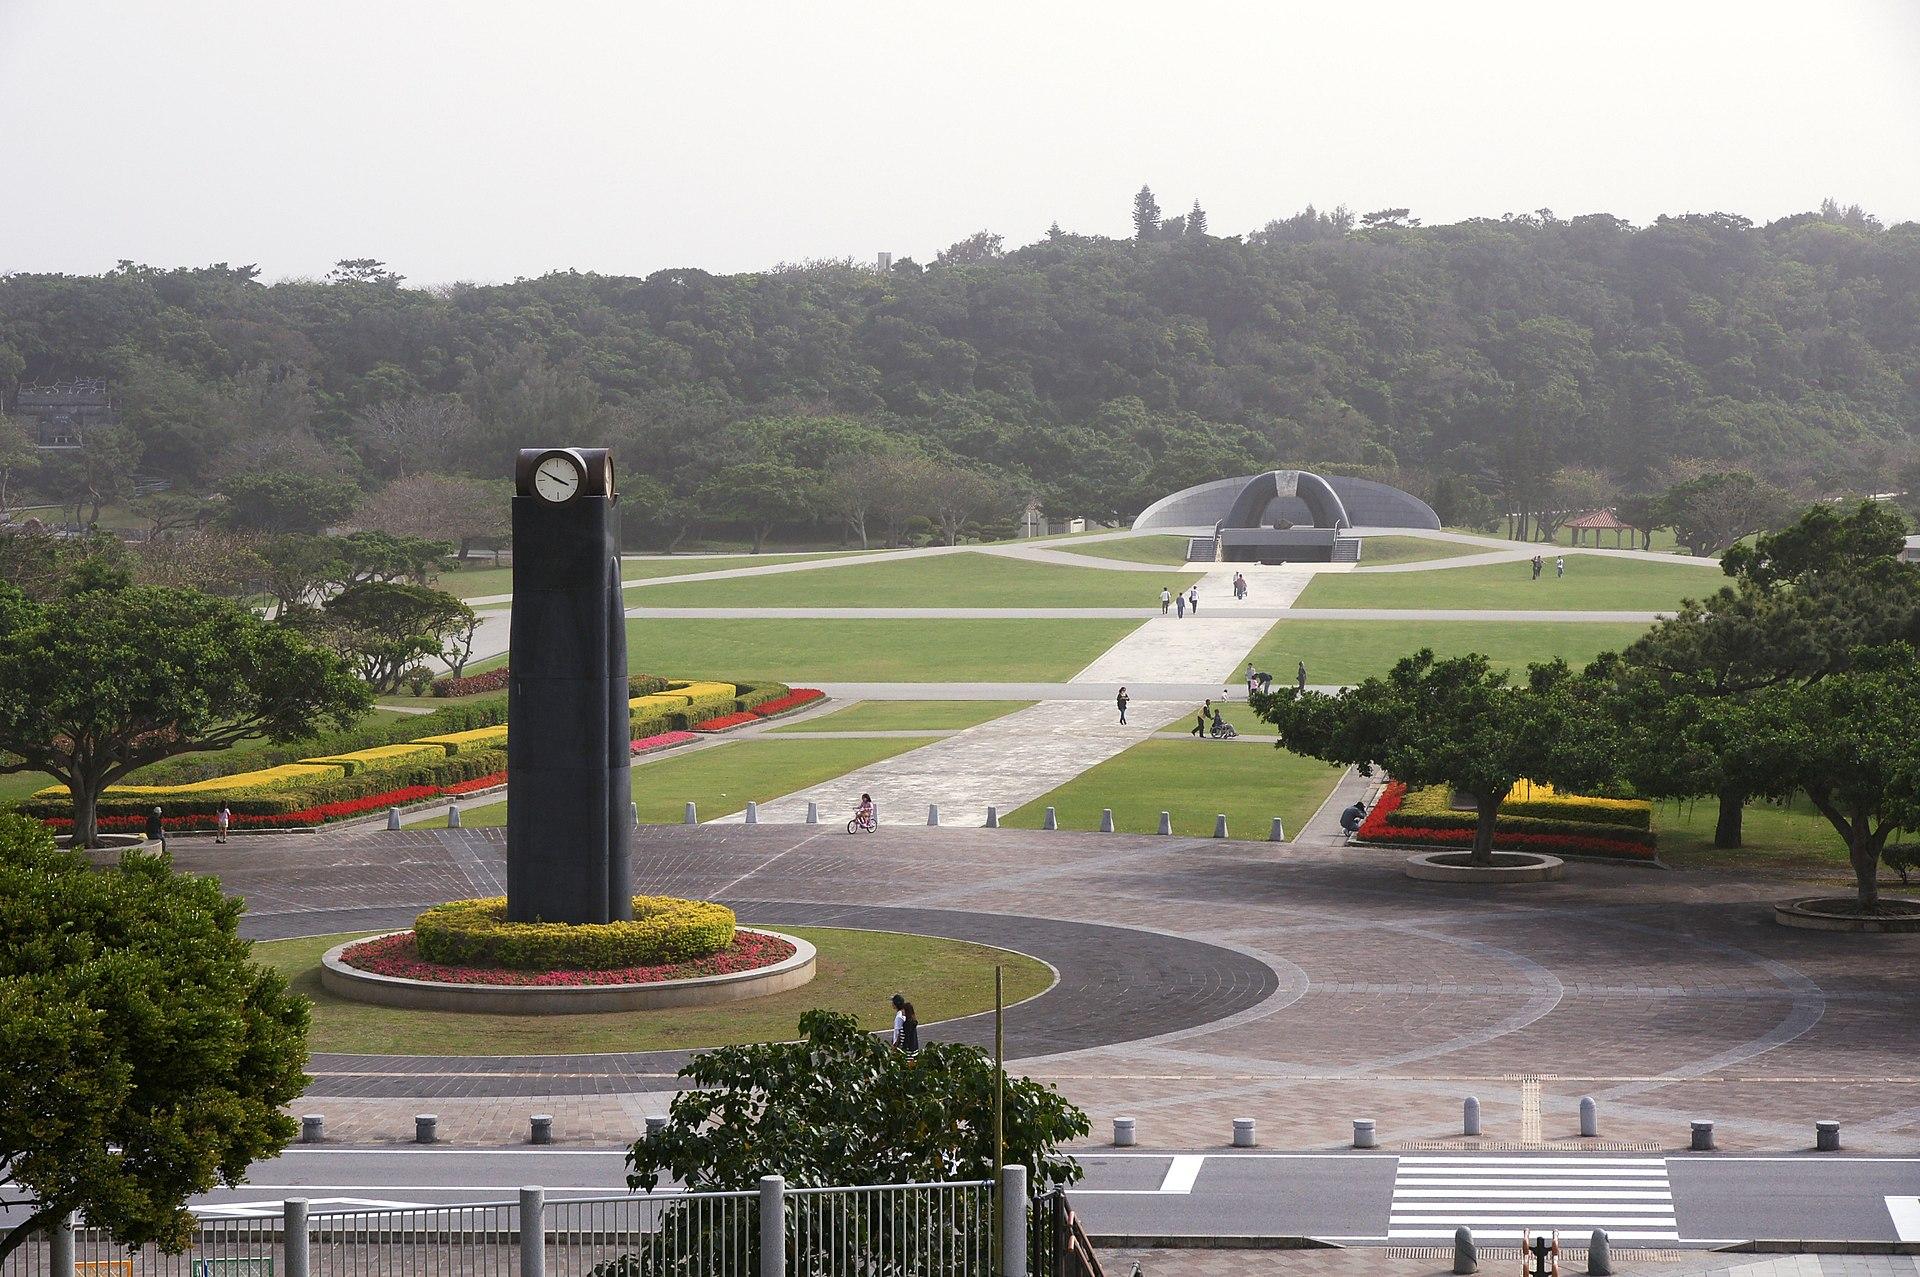 Okinawa Heiwakinen Memorial Park01n3104.jpg